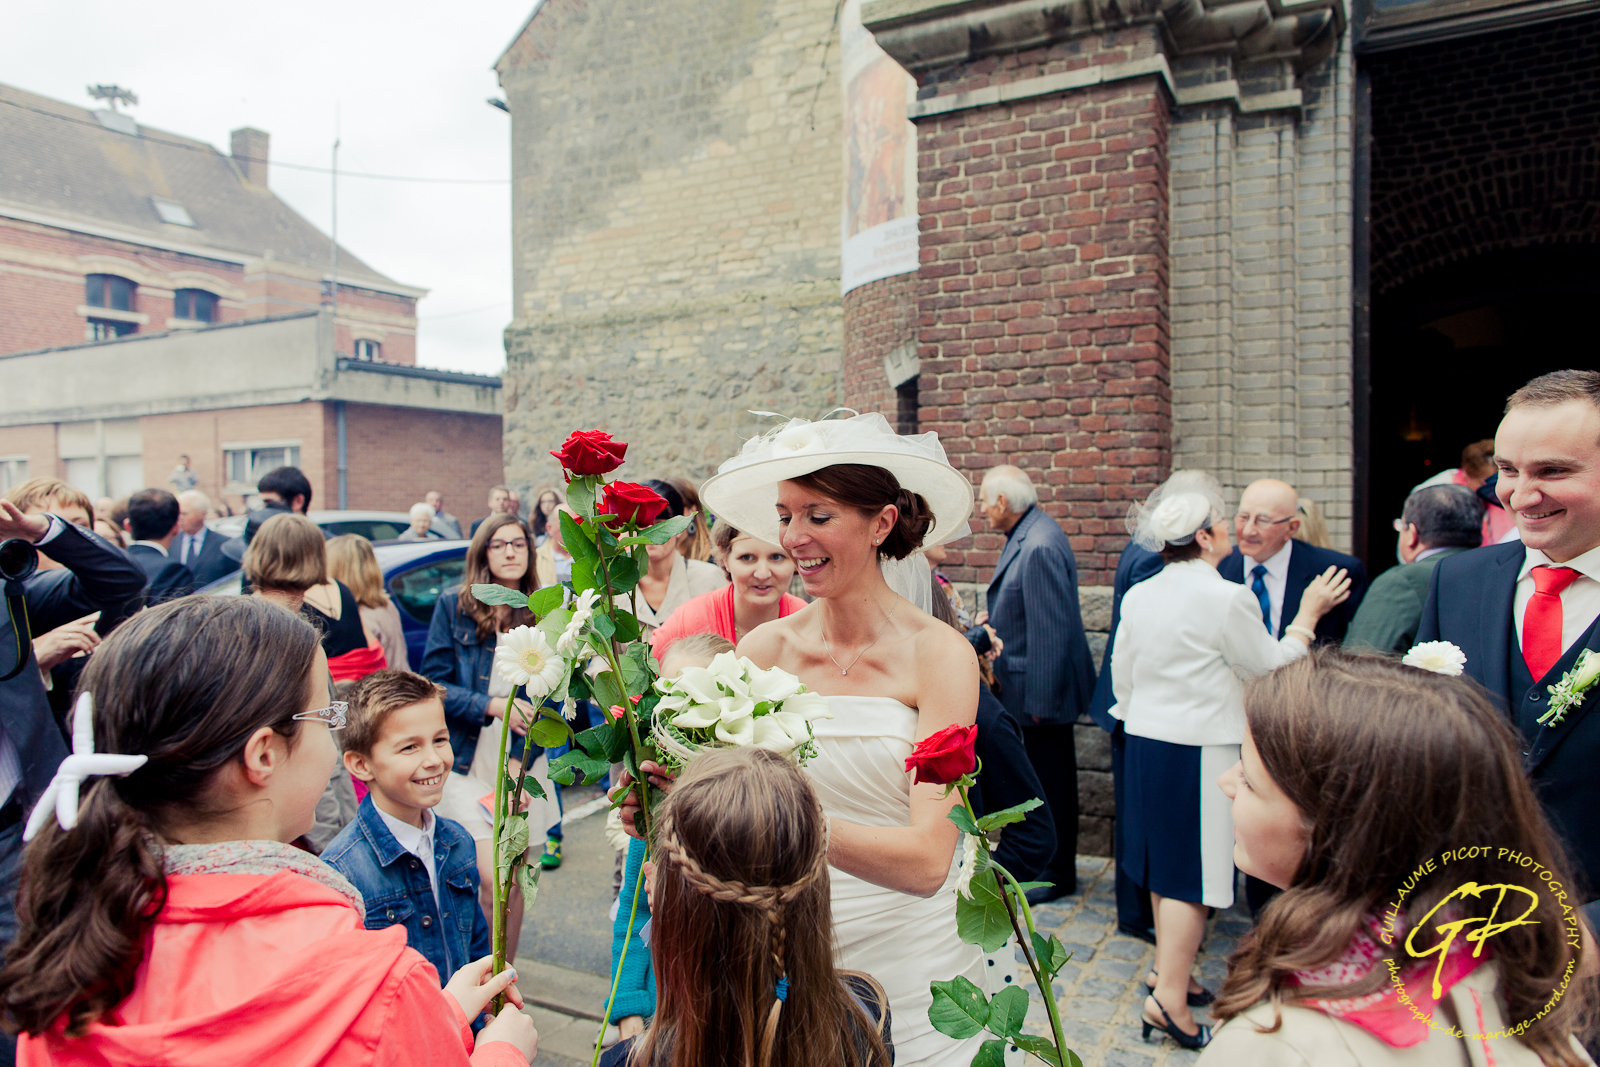 photographe mariage nord (71 sur 96)